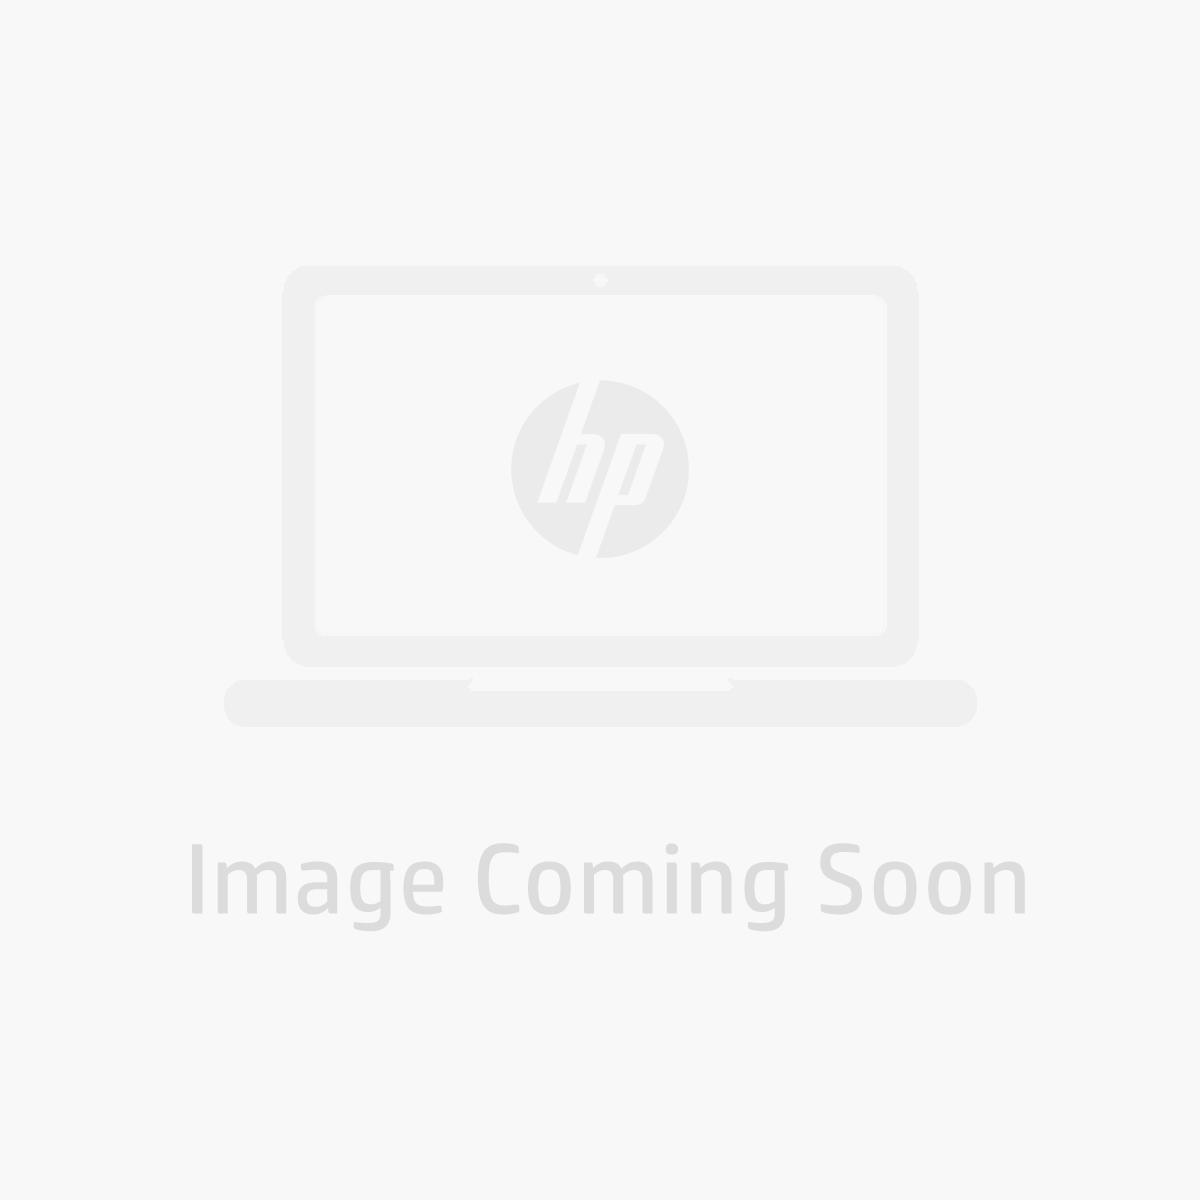 HP Elite x3 Accessory Bundle